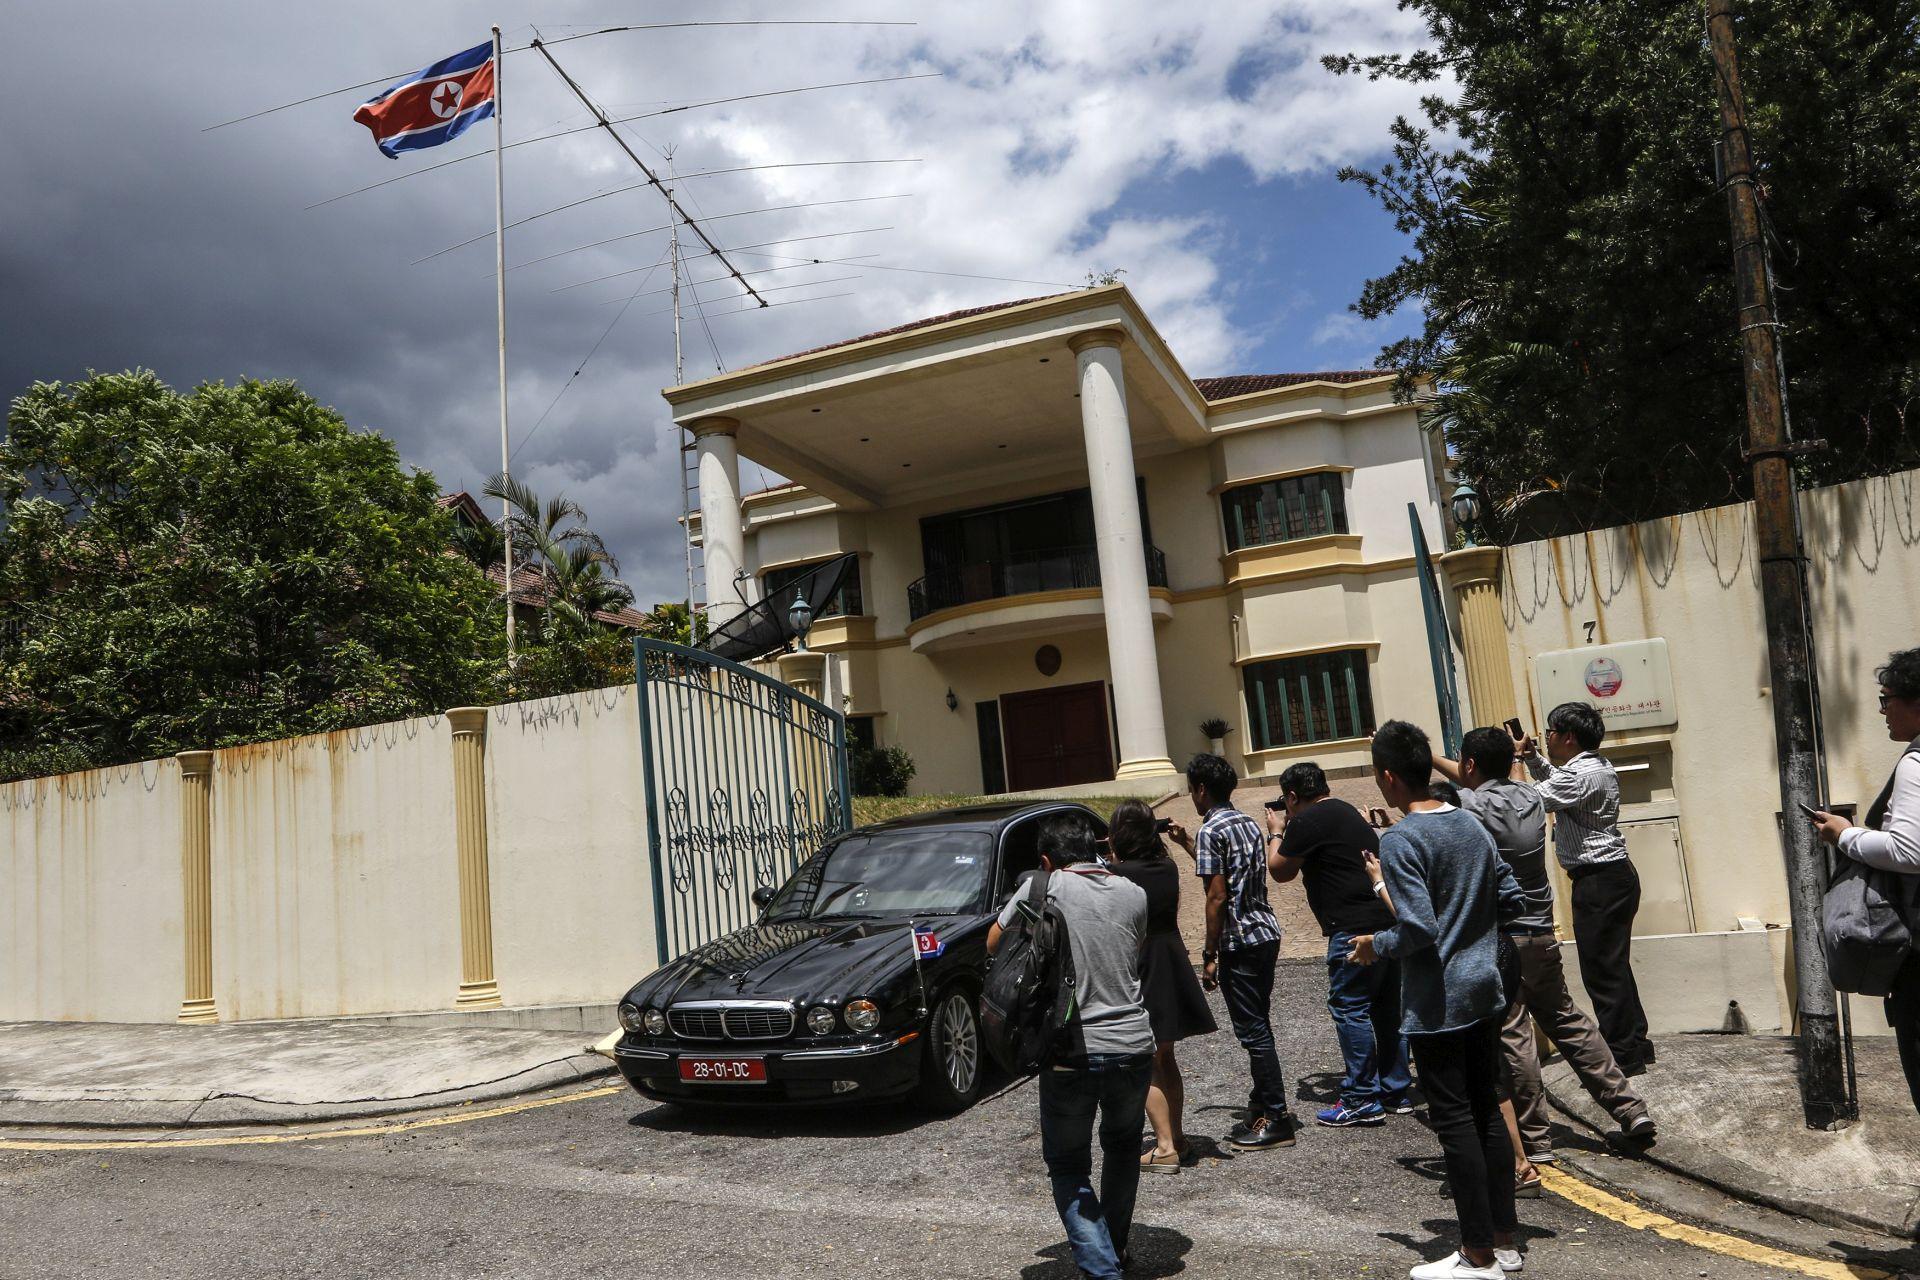 MALEZIJSKE VLASTI: Sjeverna Koreja protiv obdukcije Kima Jong Nama